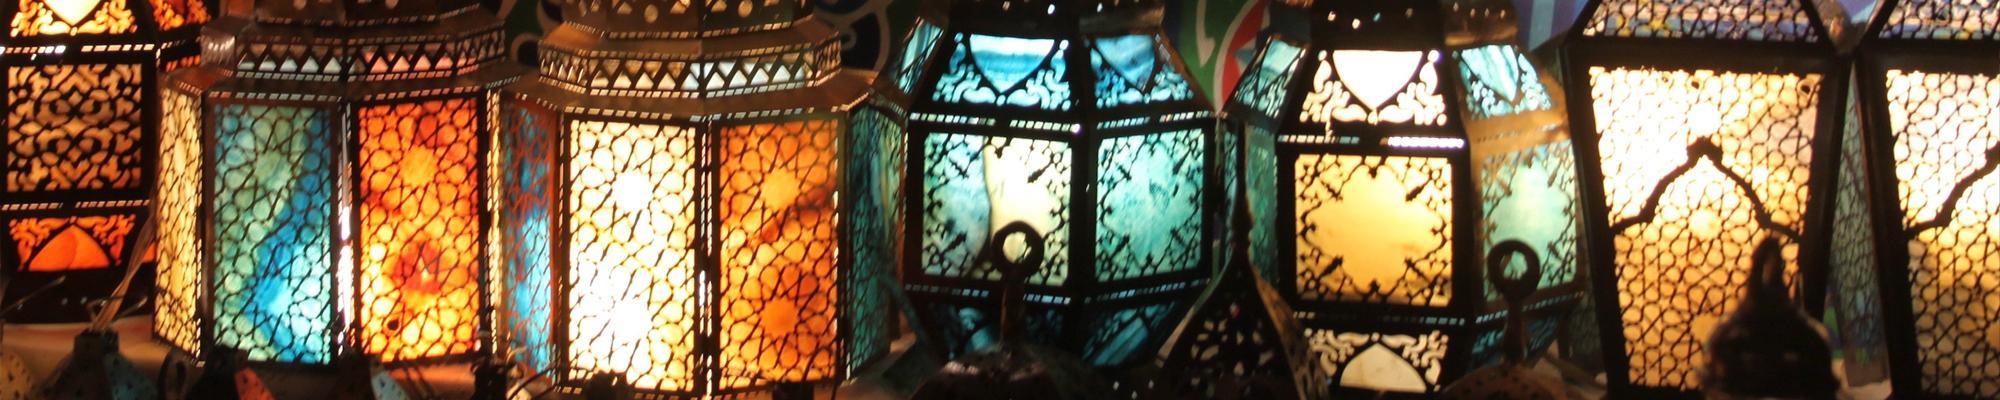 Up close of lanterns